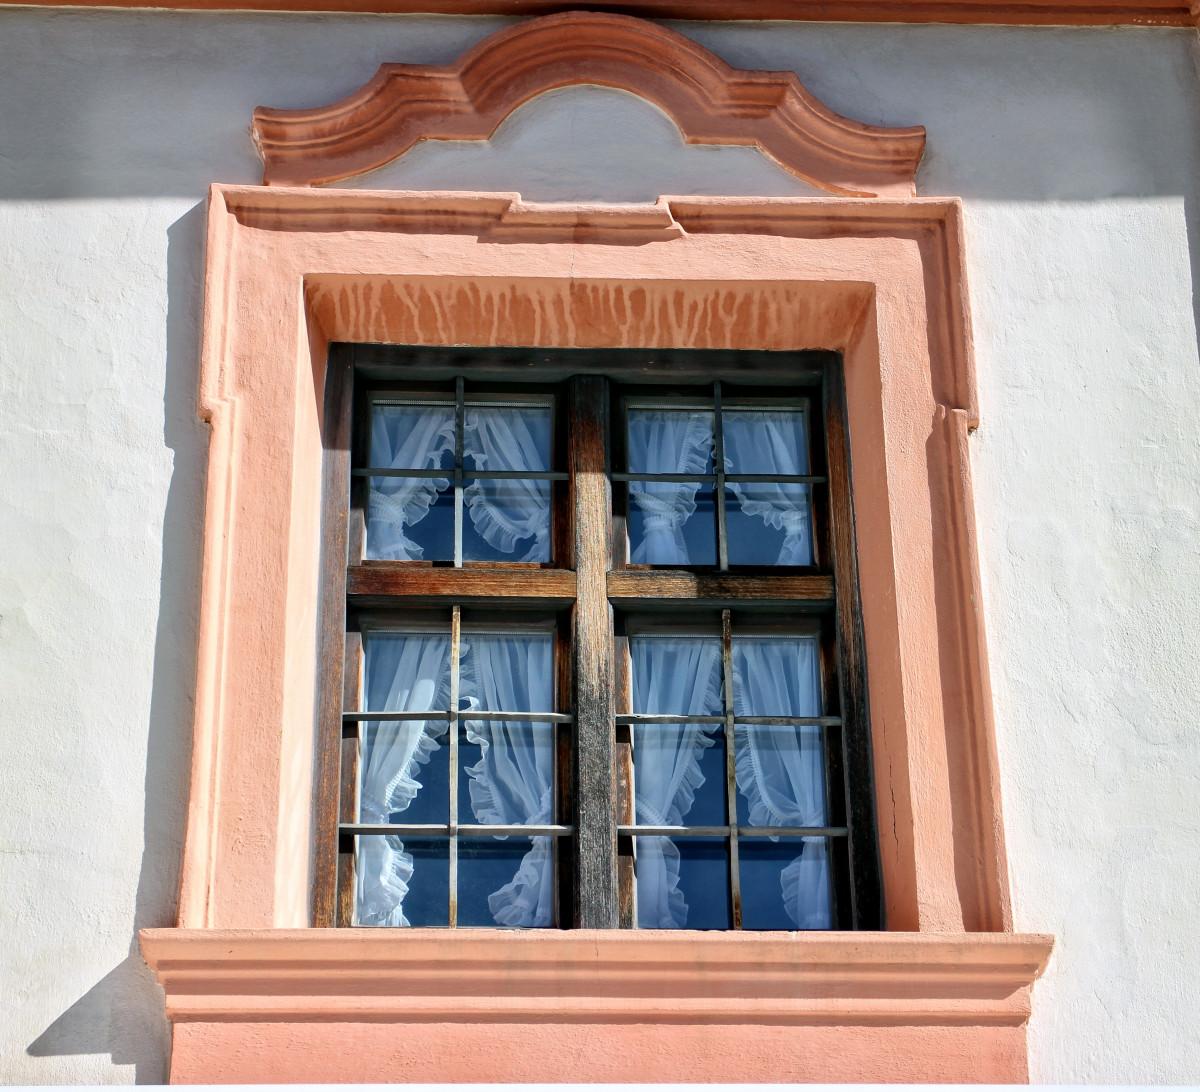 Bildet arkitektur tre hjem farge fasade bl d r for Puertas y ventanas usadas en rosario